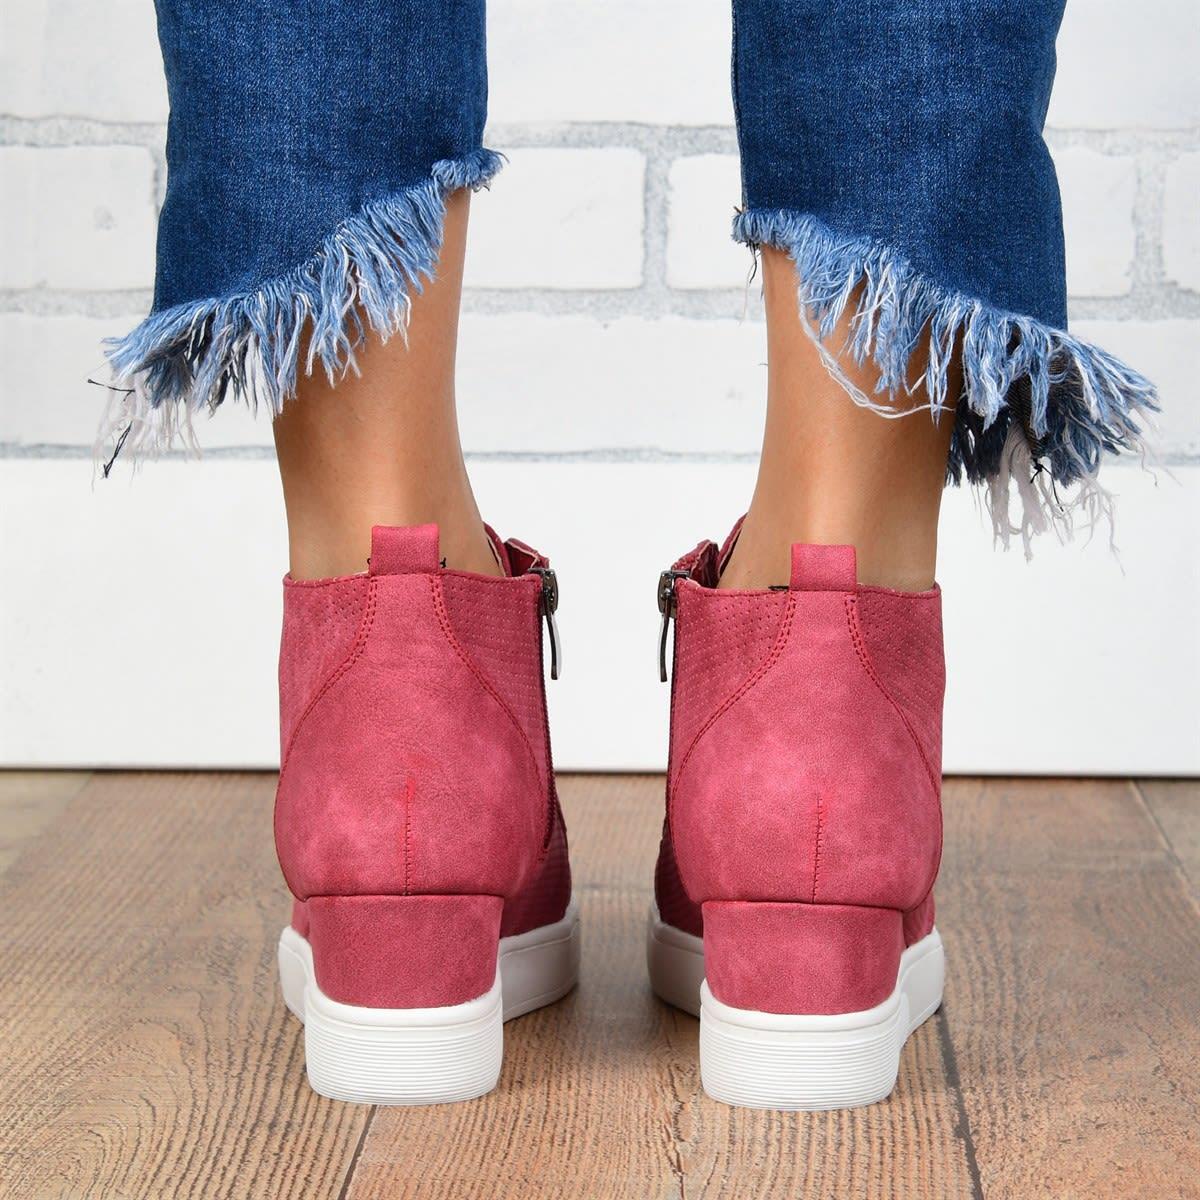 Chic Sneaker Wedges